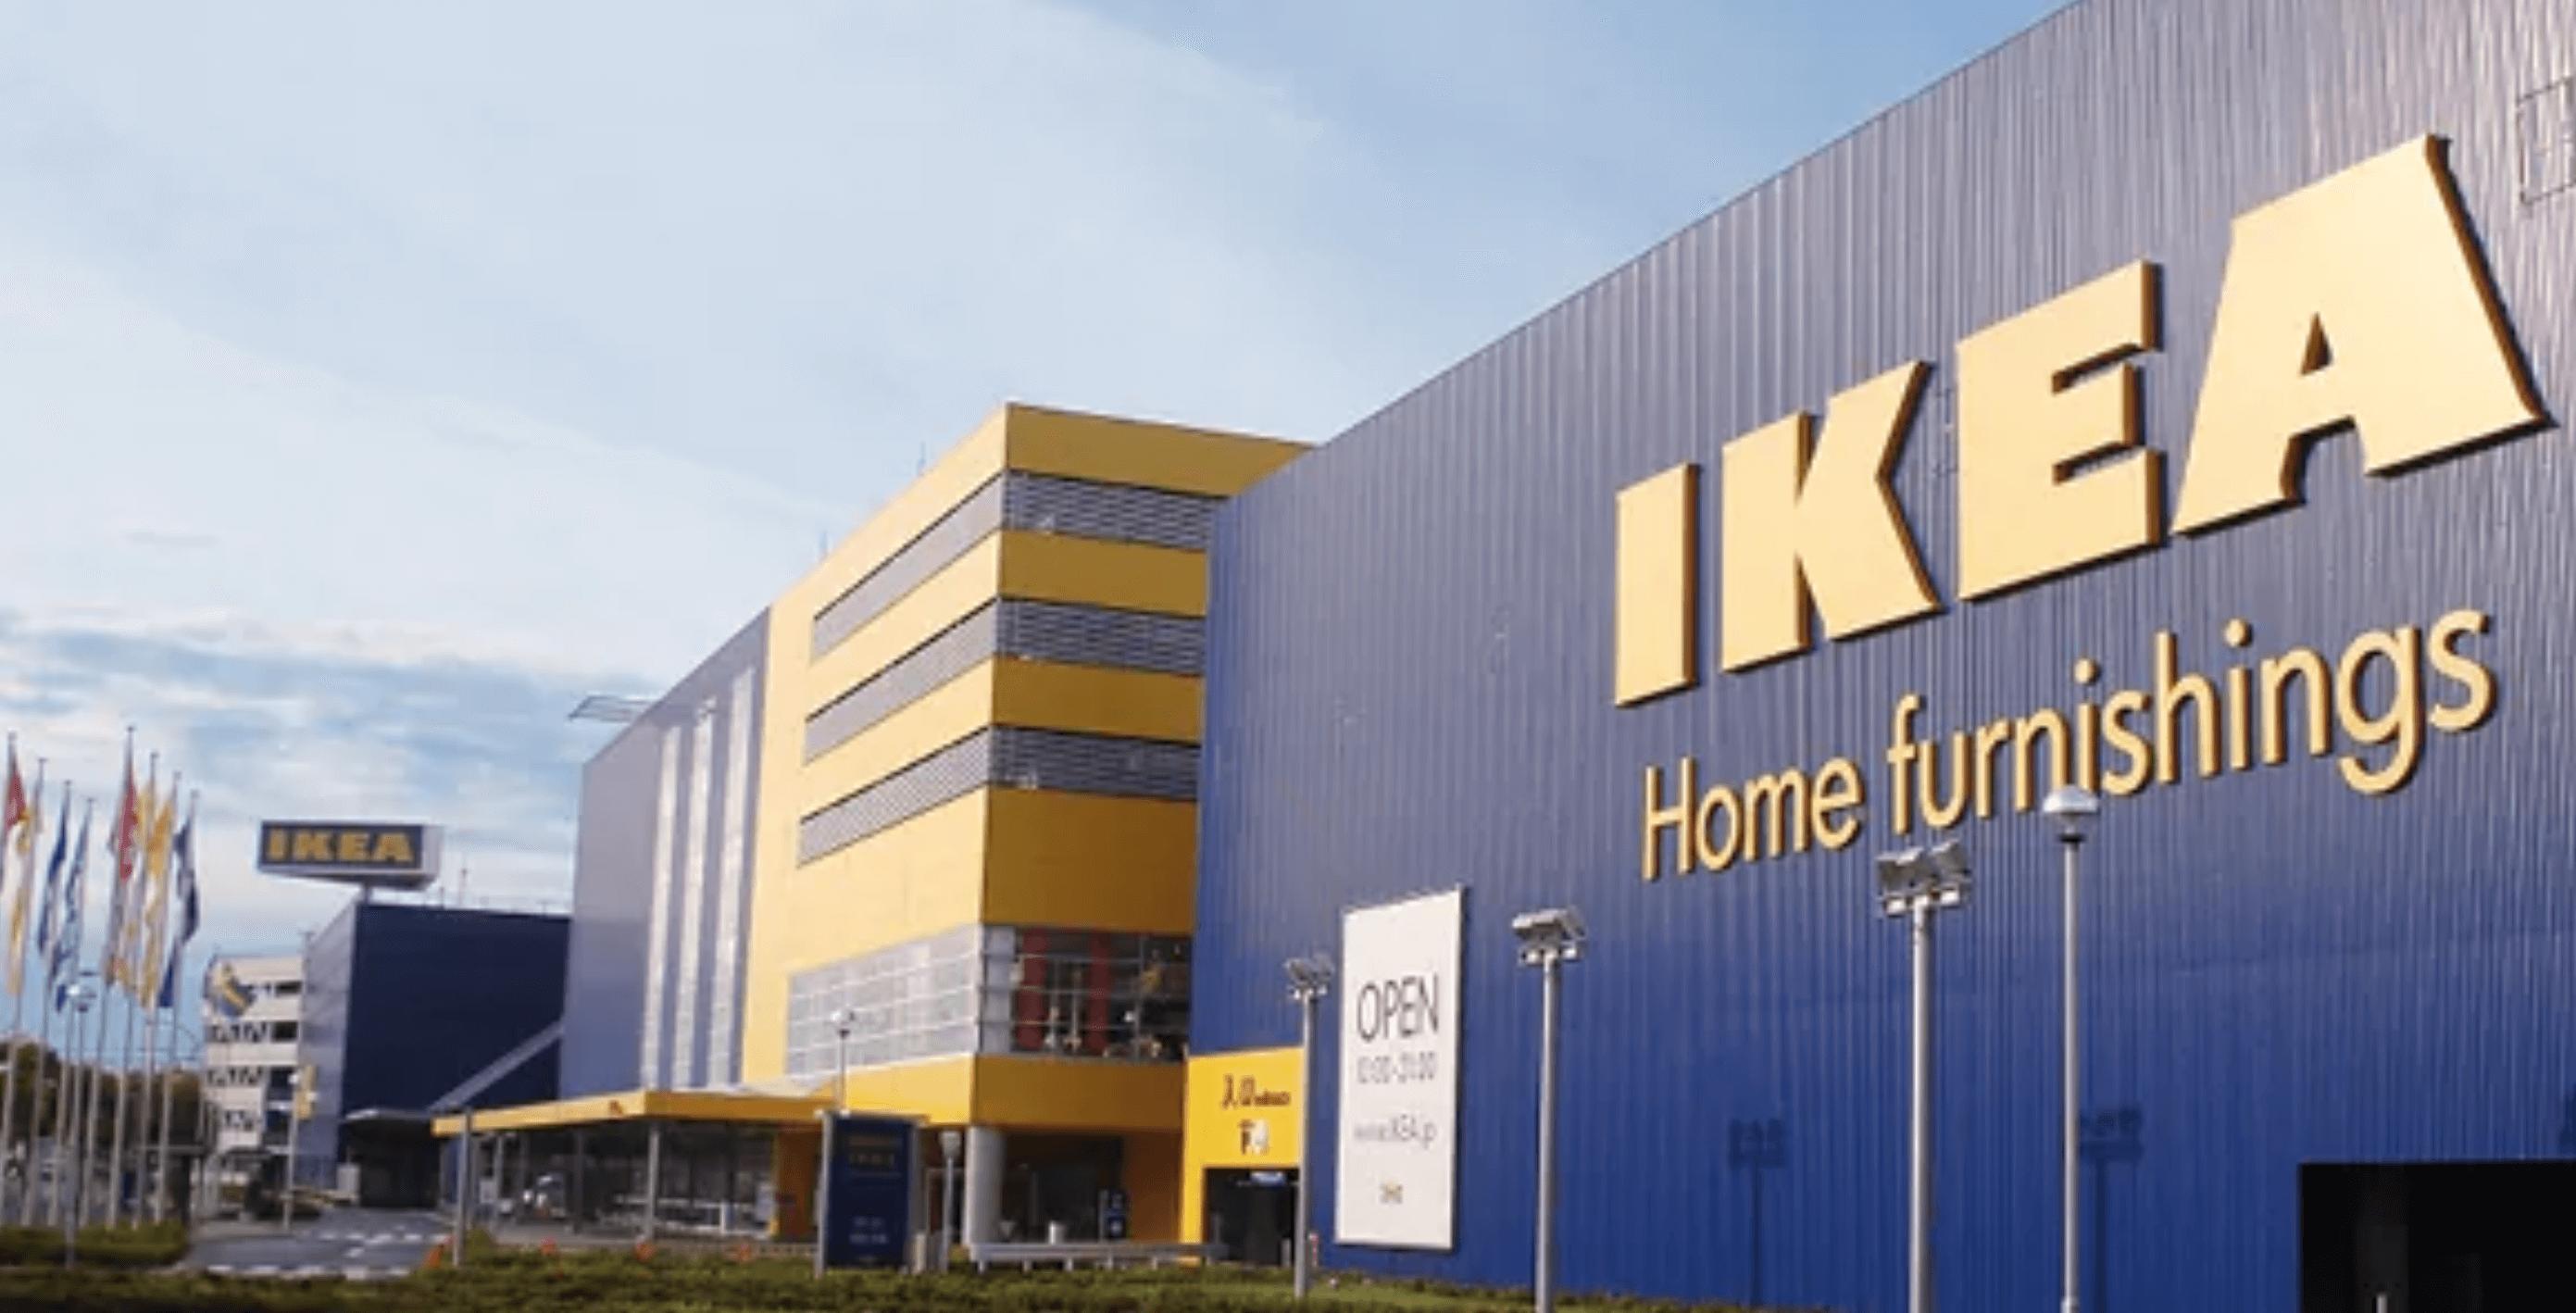 IKEAの参考画像